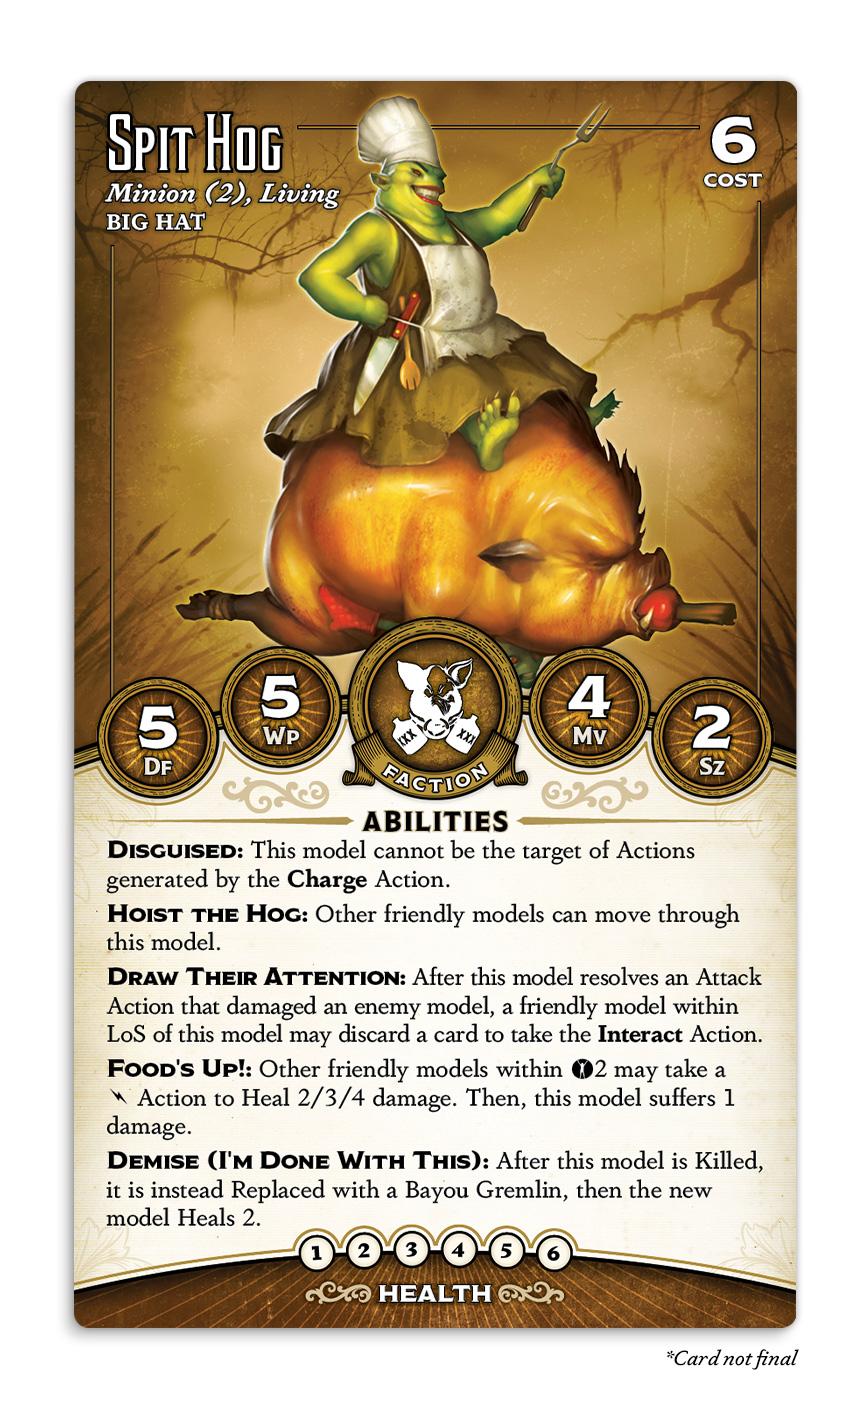 WaldosWeekly_0123_SpitHog_Card-Front.jpg